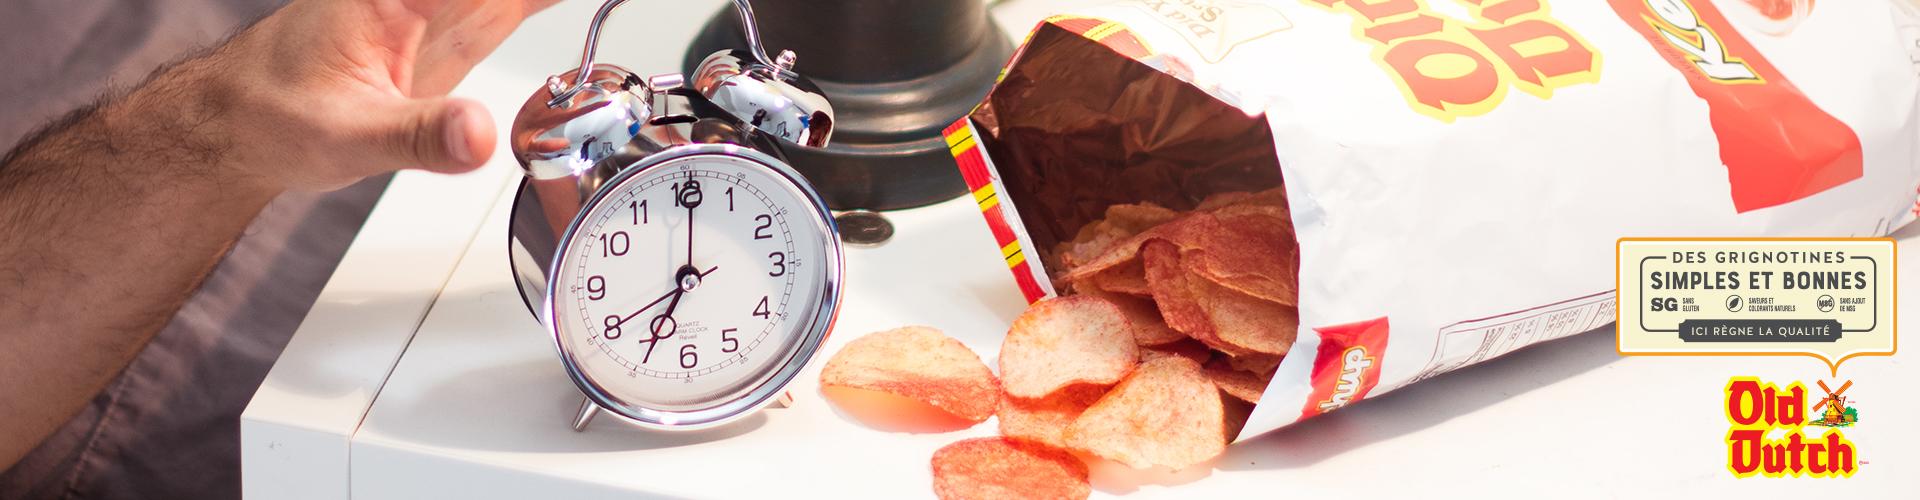 Snack to Basics 3